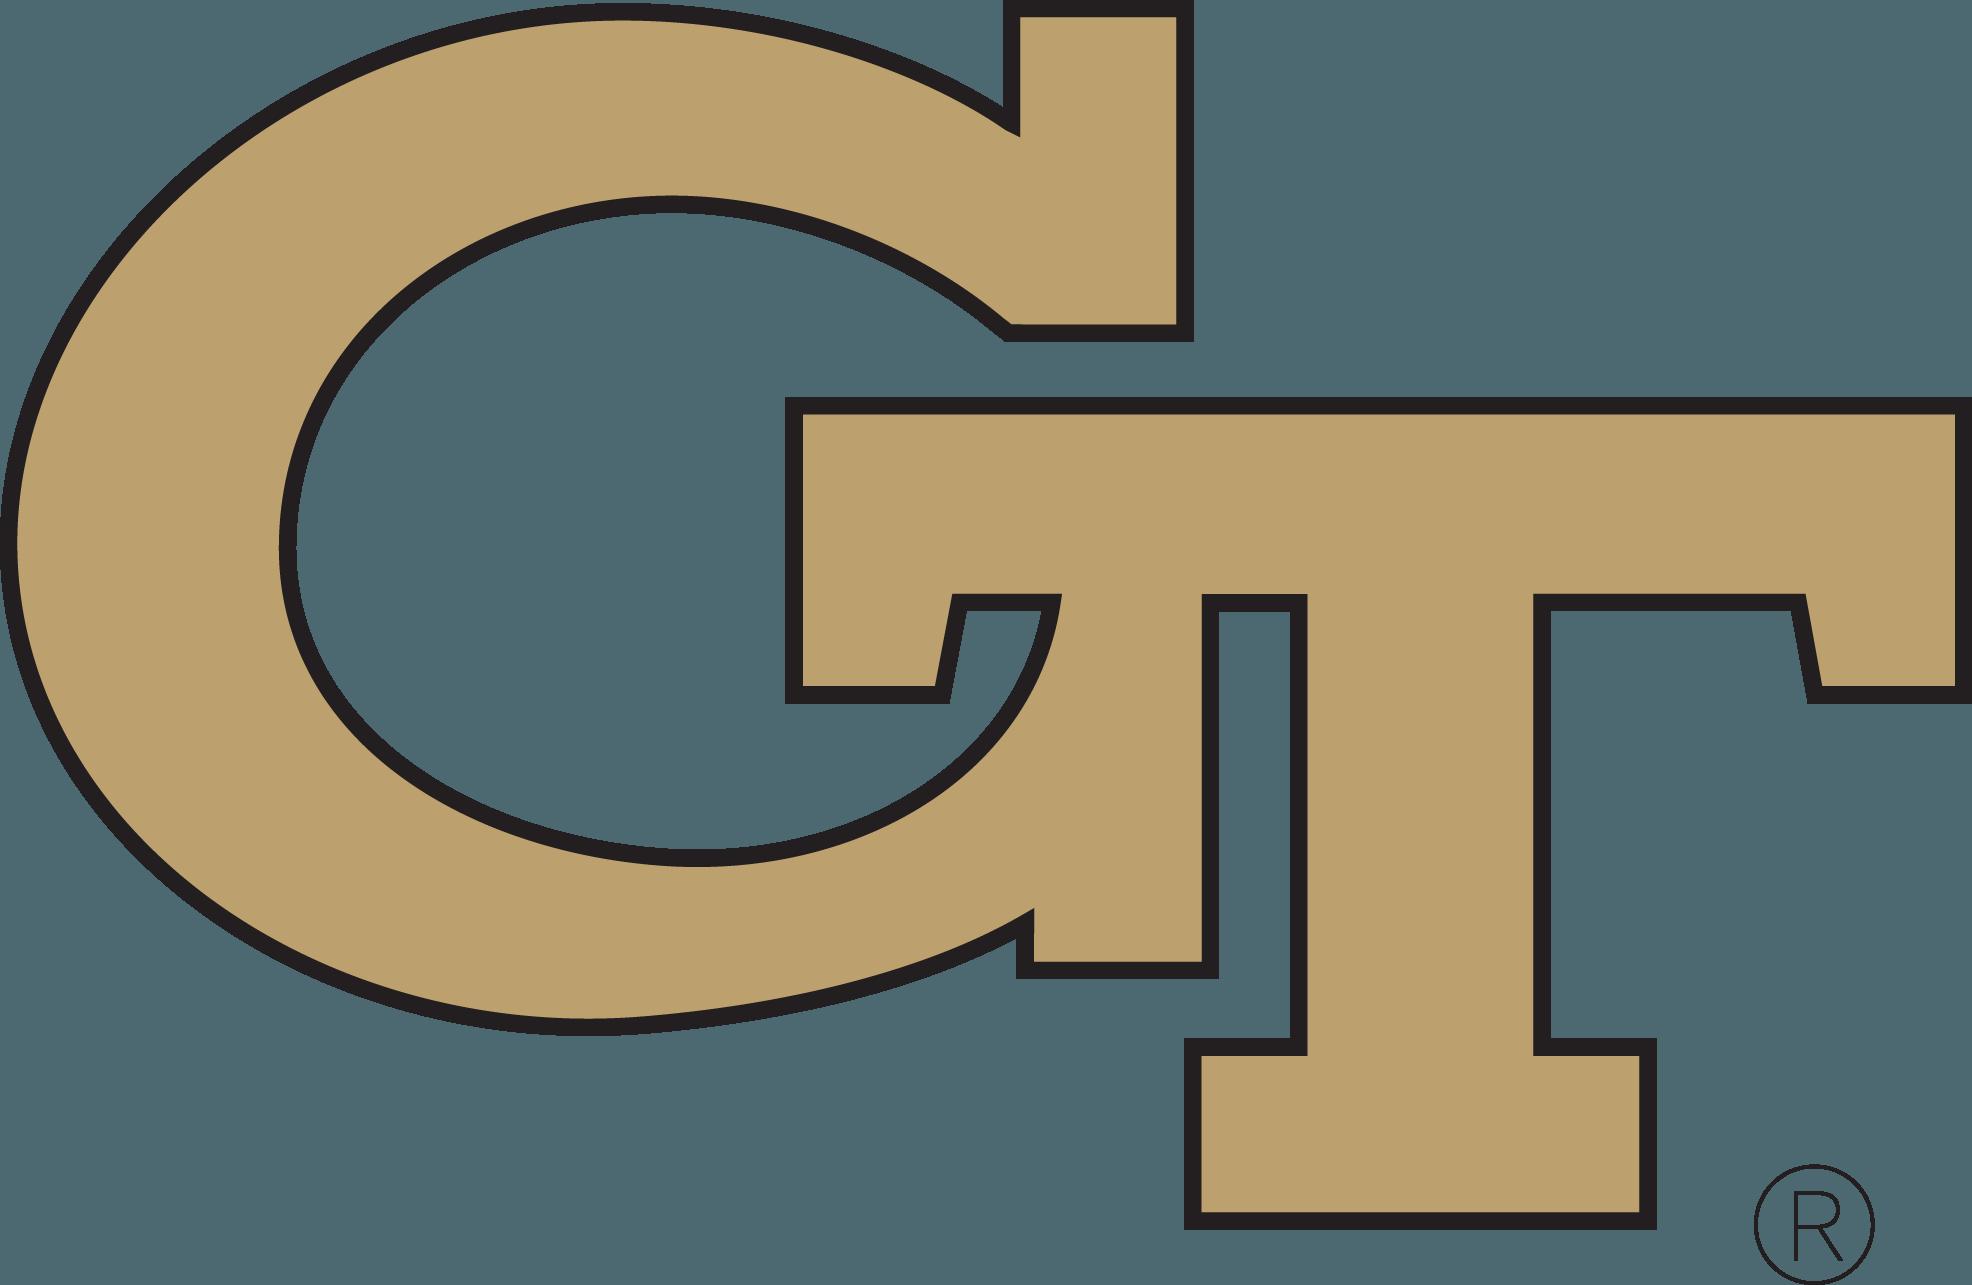 gt-logo_georgia_tech_yellow_jackets